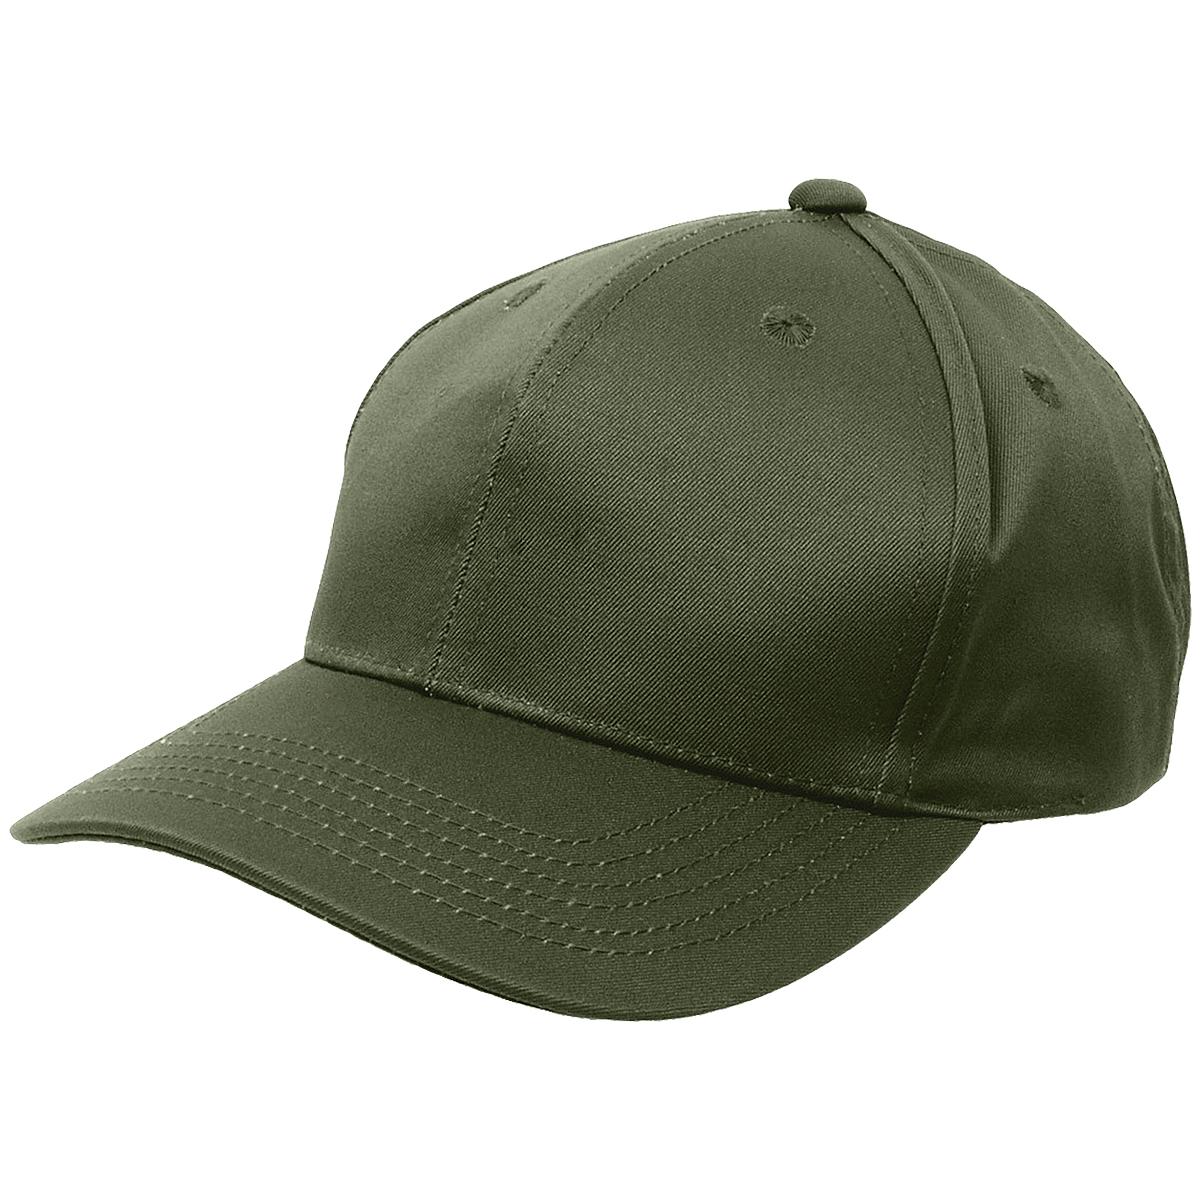 Mfh Baseball Cap Od Green Baseball Caps Military 1st